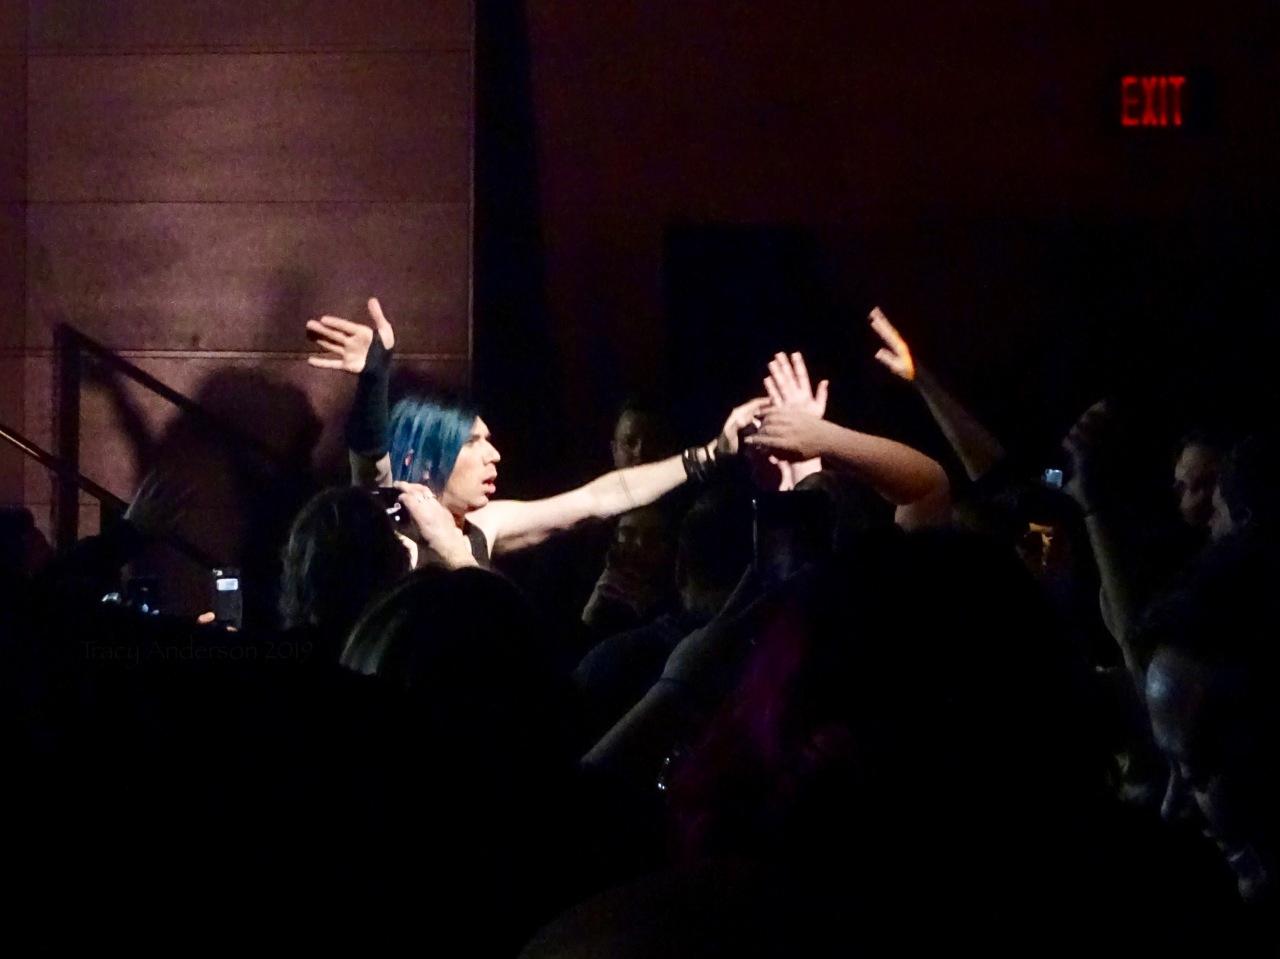 Josh Ramsay In The Crowd Marianas Trench Suspending Gravity Tour Edmonton Northern Alberta Jubilee Auditorium Mar 26 2019